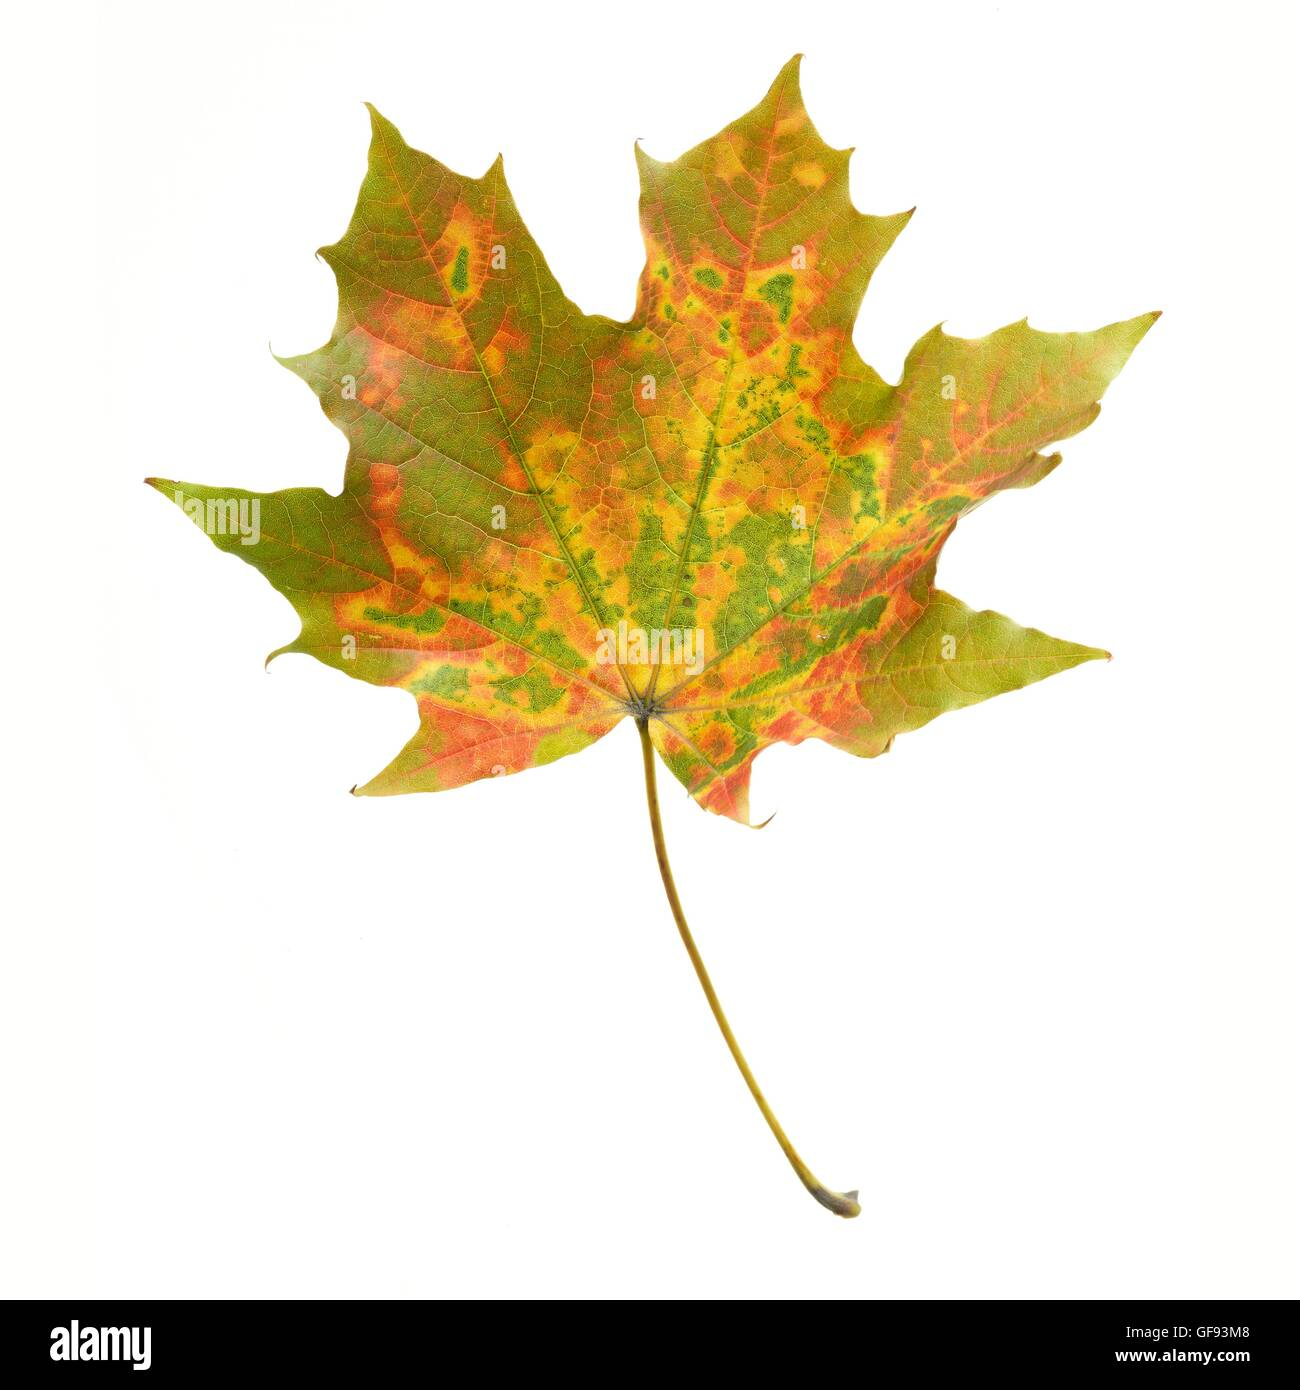 Maple (Acer) leaf, studio shot. - Stock Image